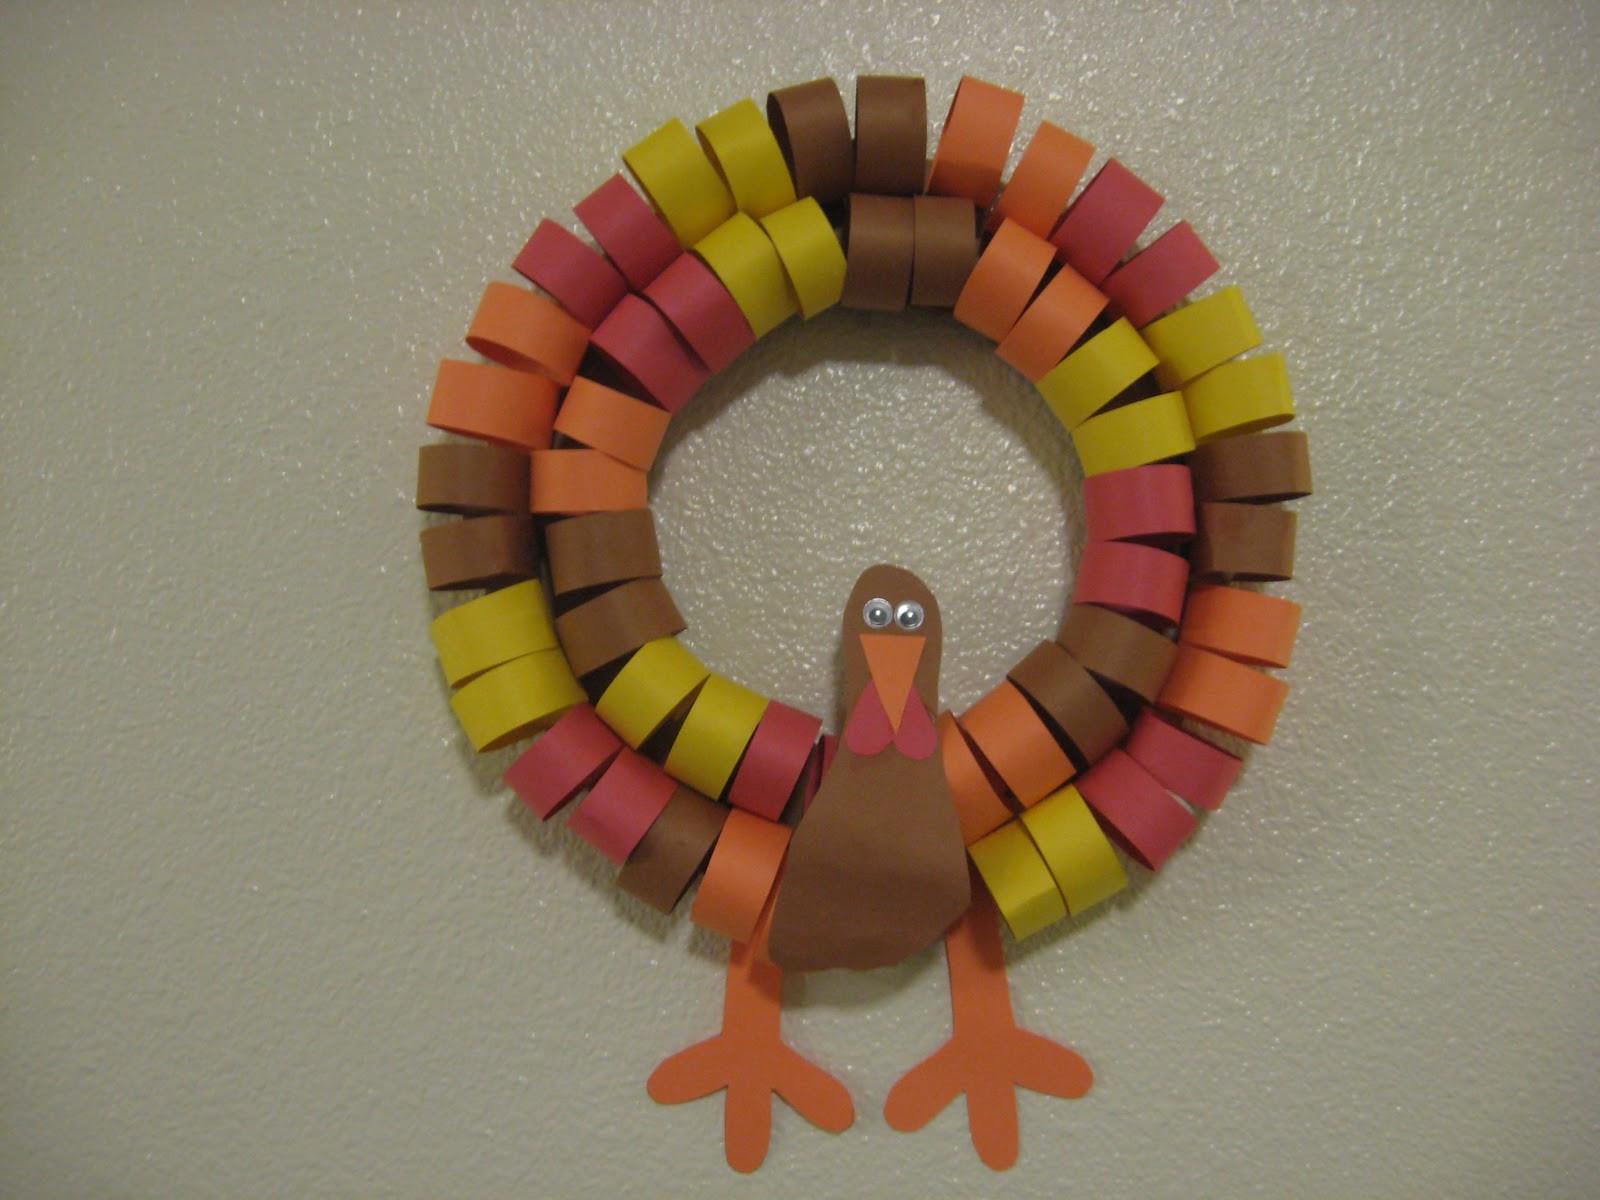 Thanksgiving Turkey Projects  Hugs and Keepsakes 18 THANKSGIVING CRAFT IDEAS